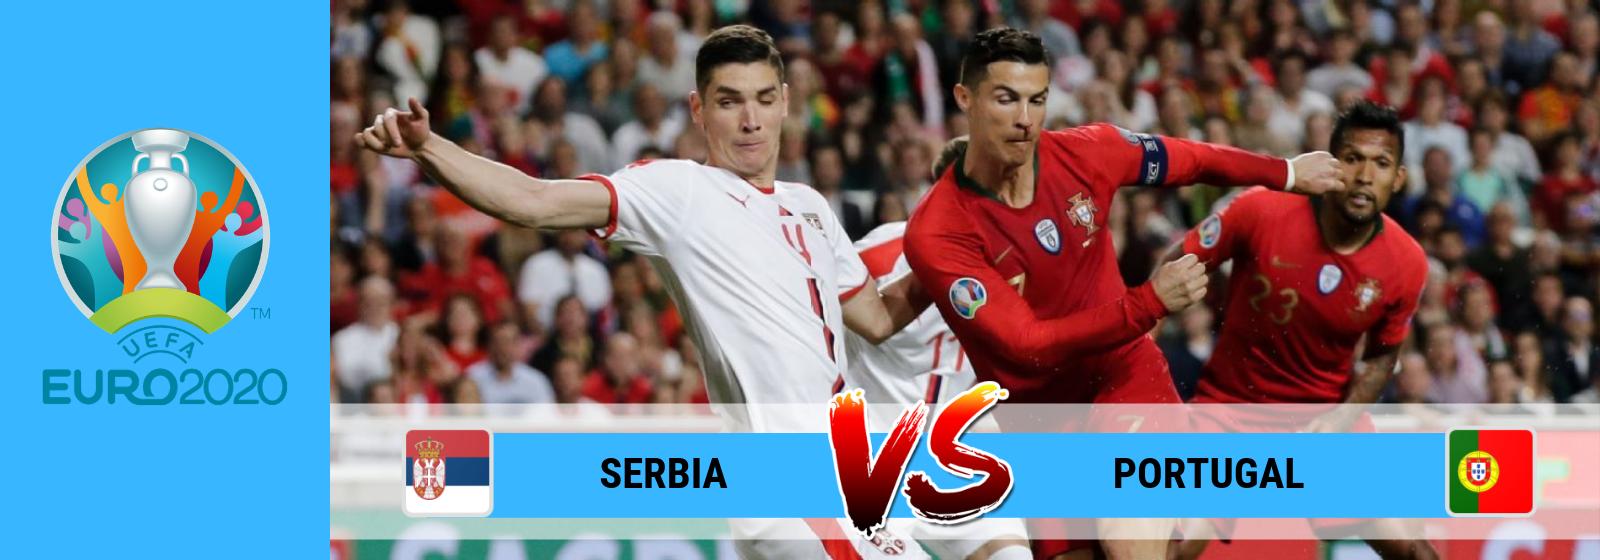 Euro 2020 Serbia Vs. Portugal Asian Connect